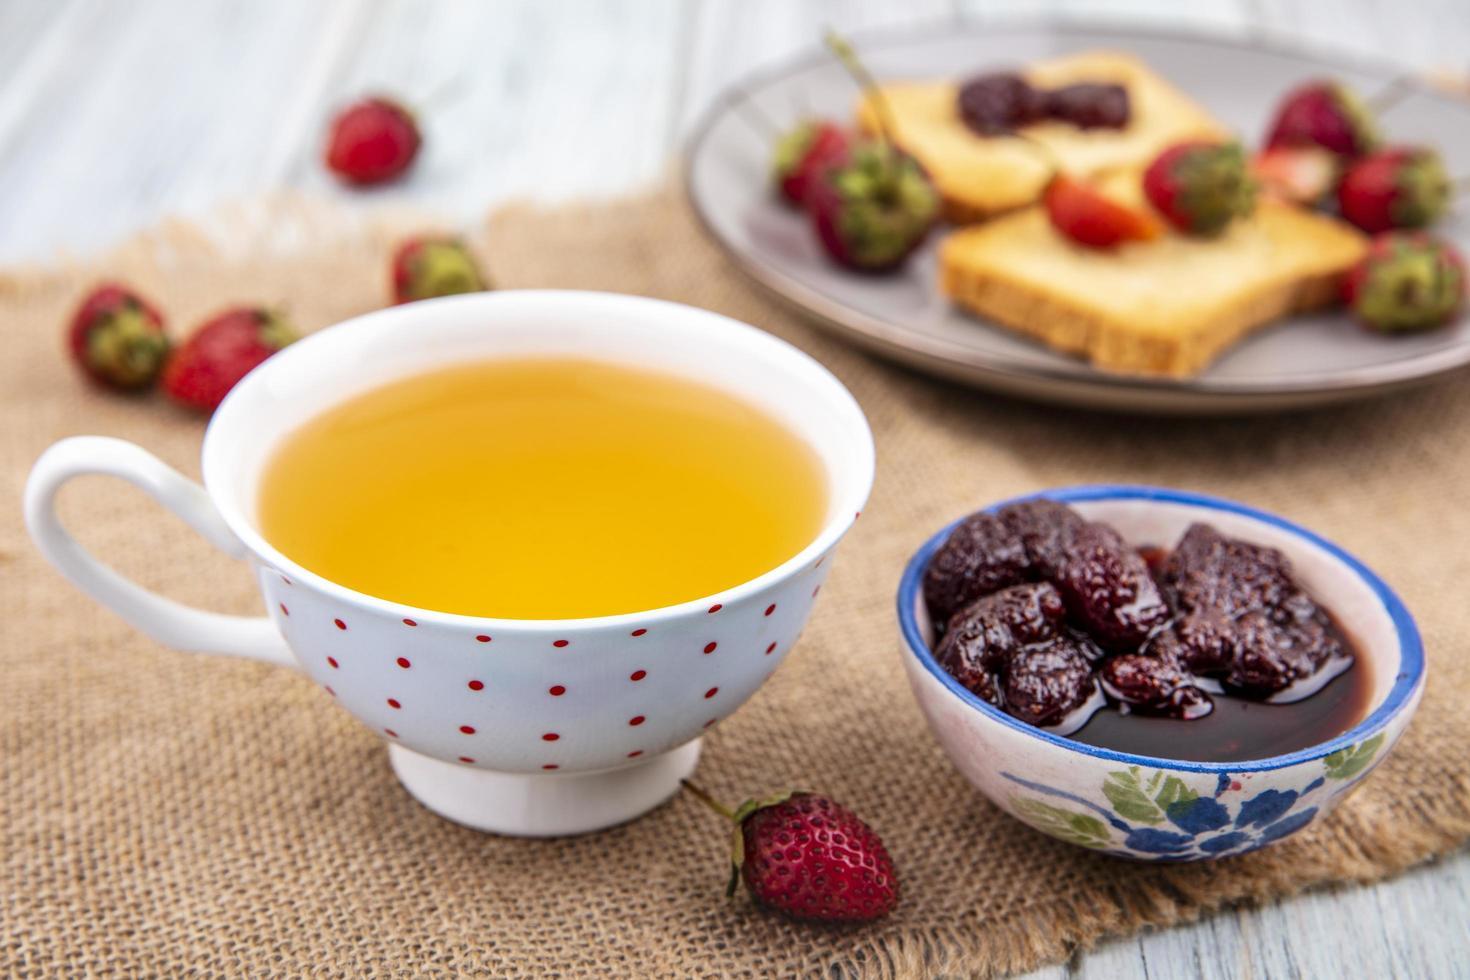 Té y mermelada con tostadas sobre fondo de madera foto